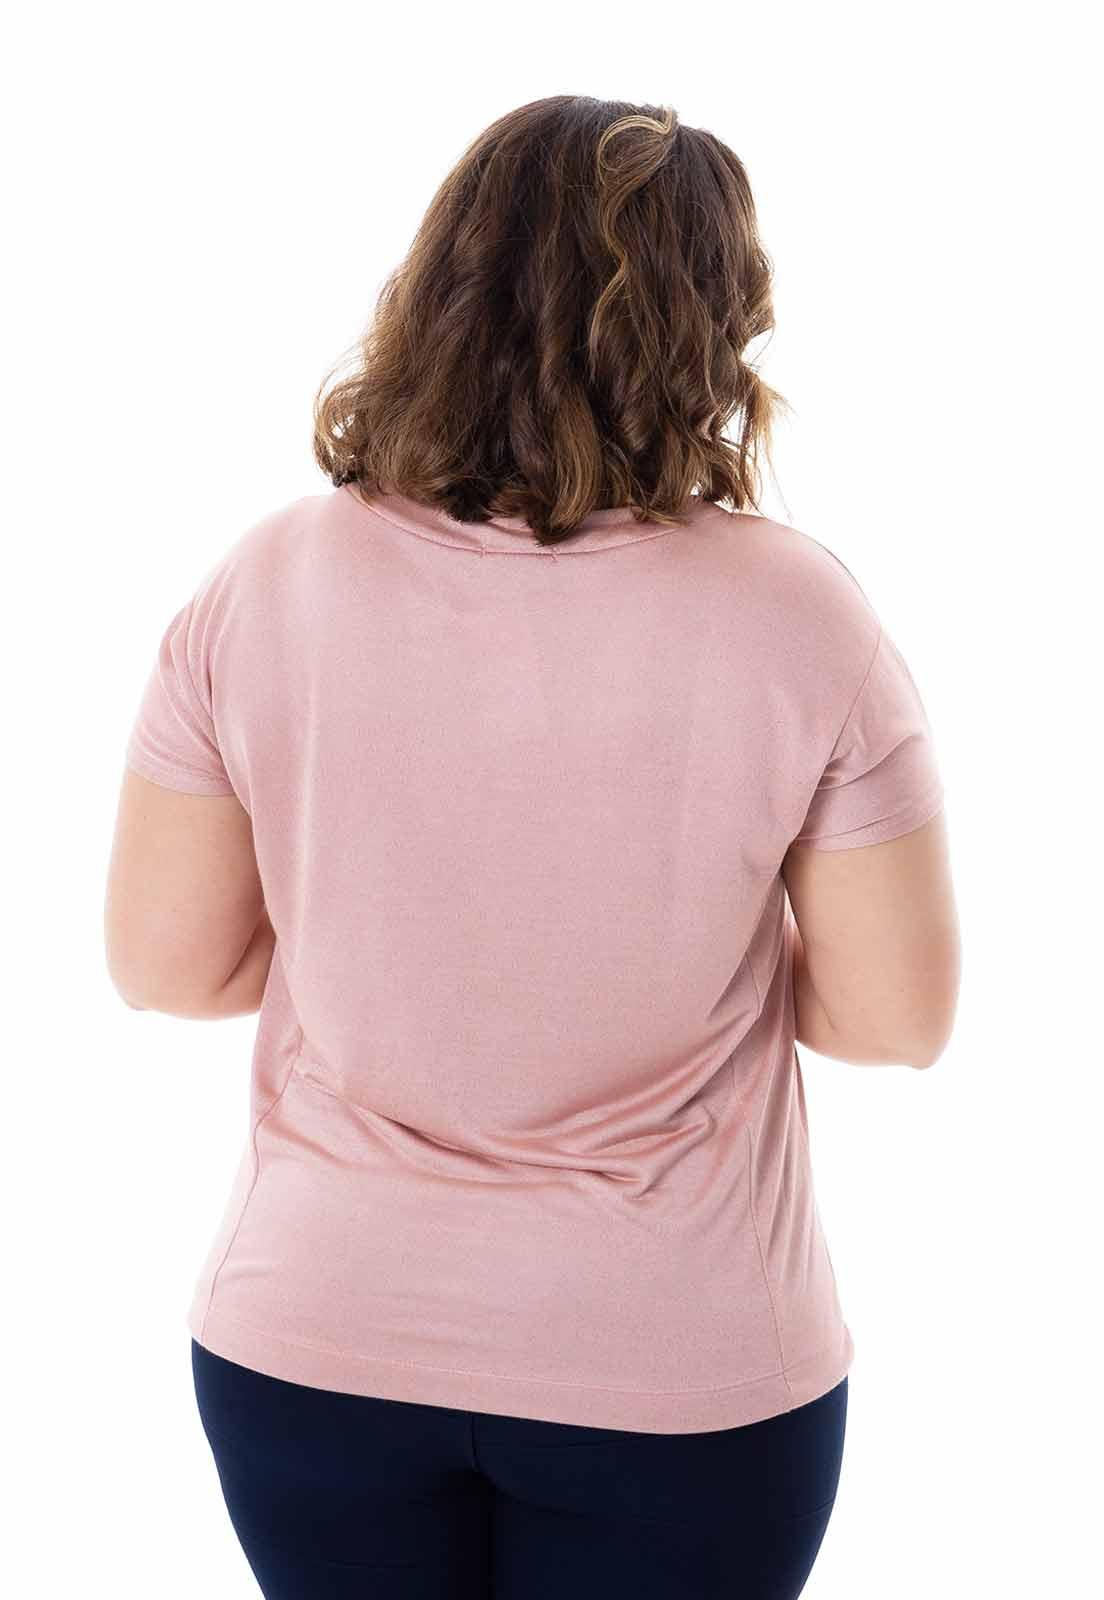 Blusa plus size com malha metalizada rosa